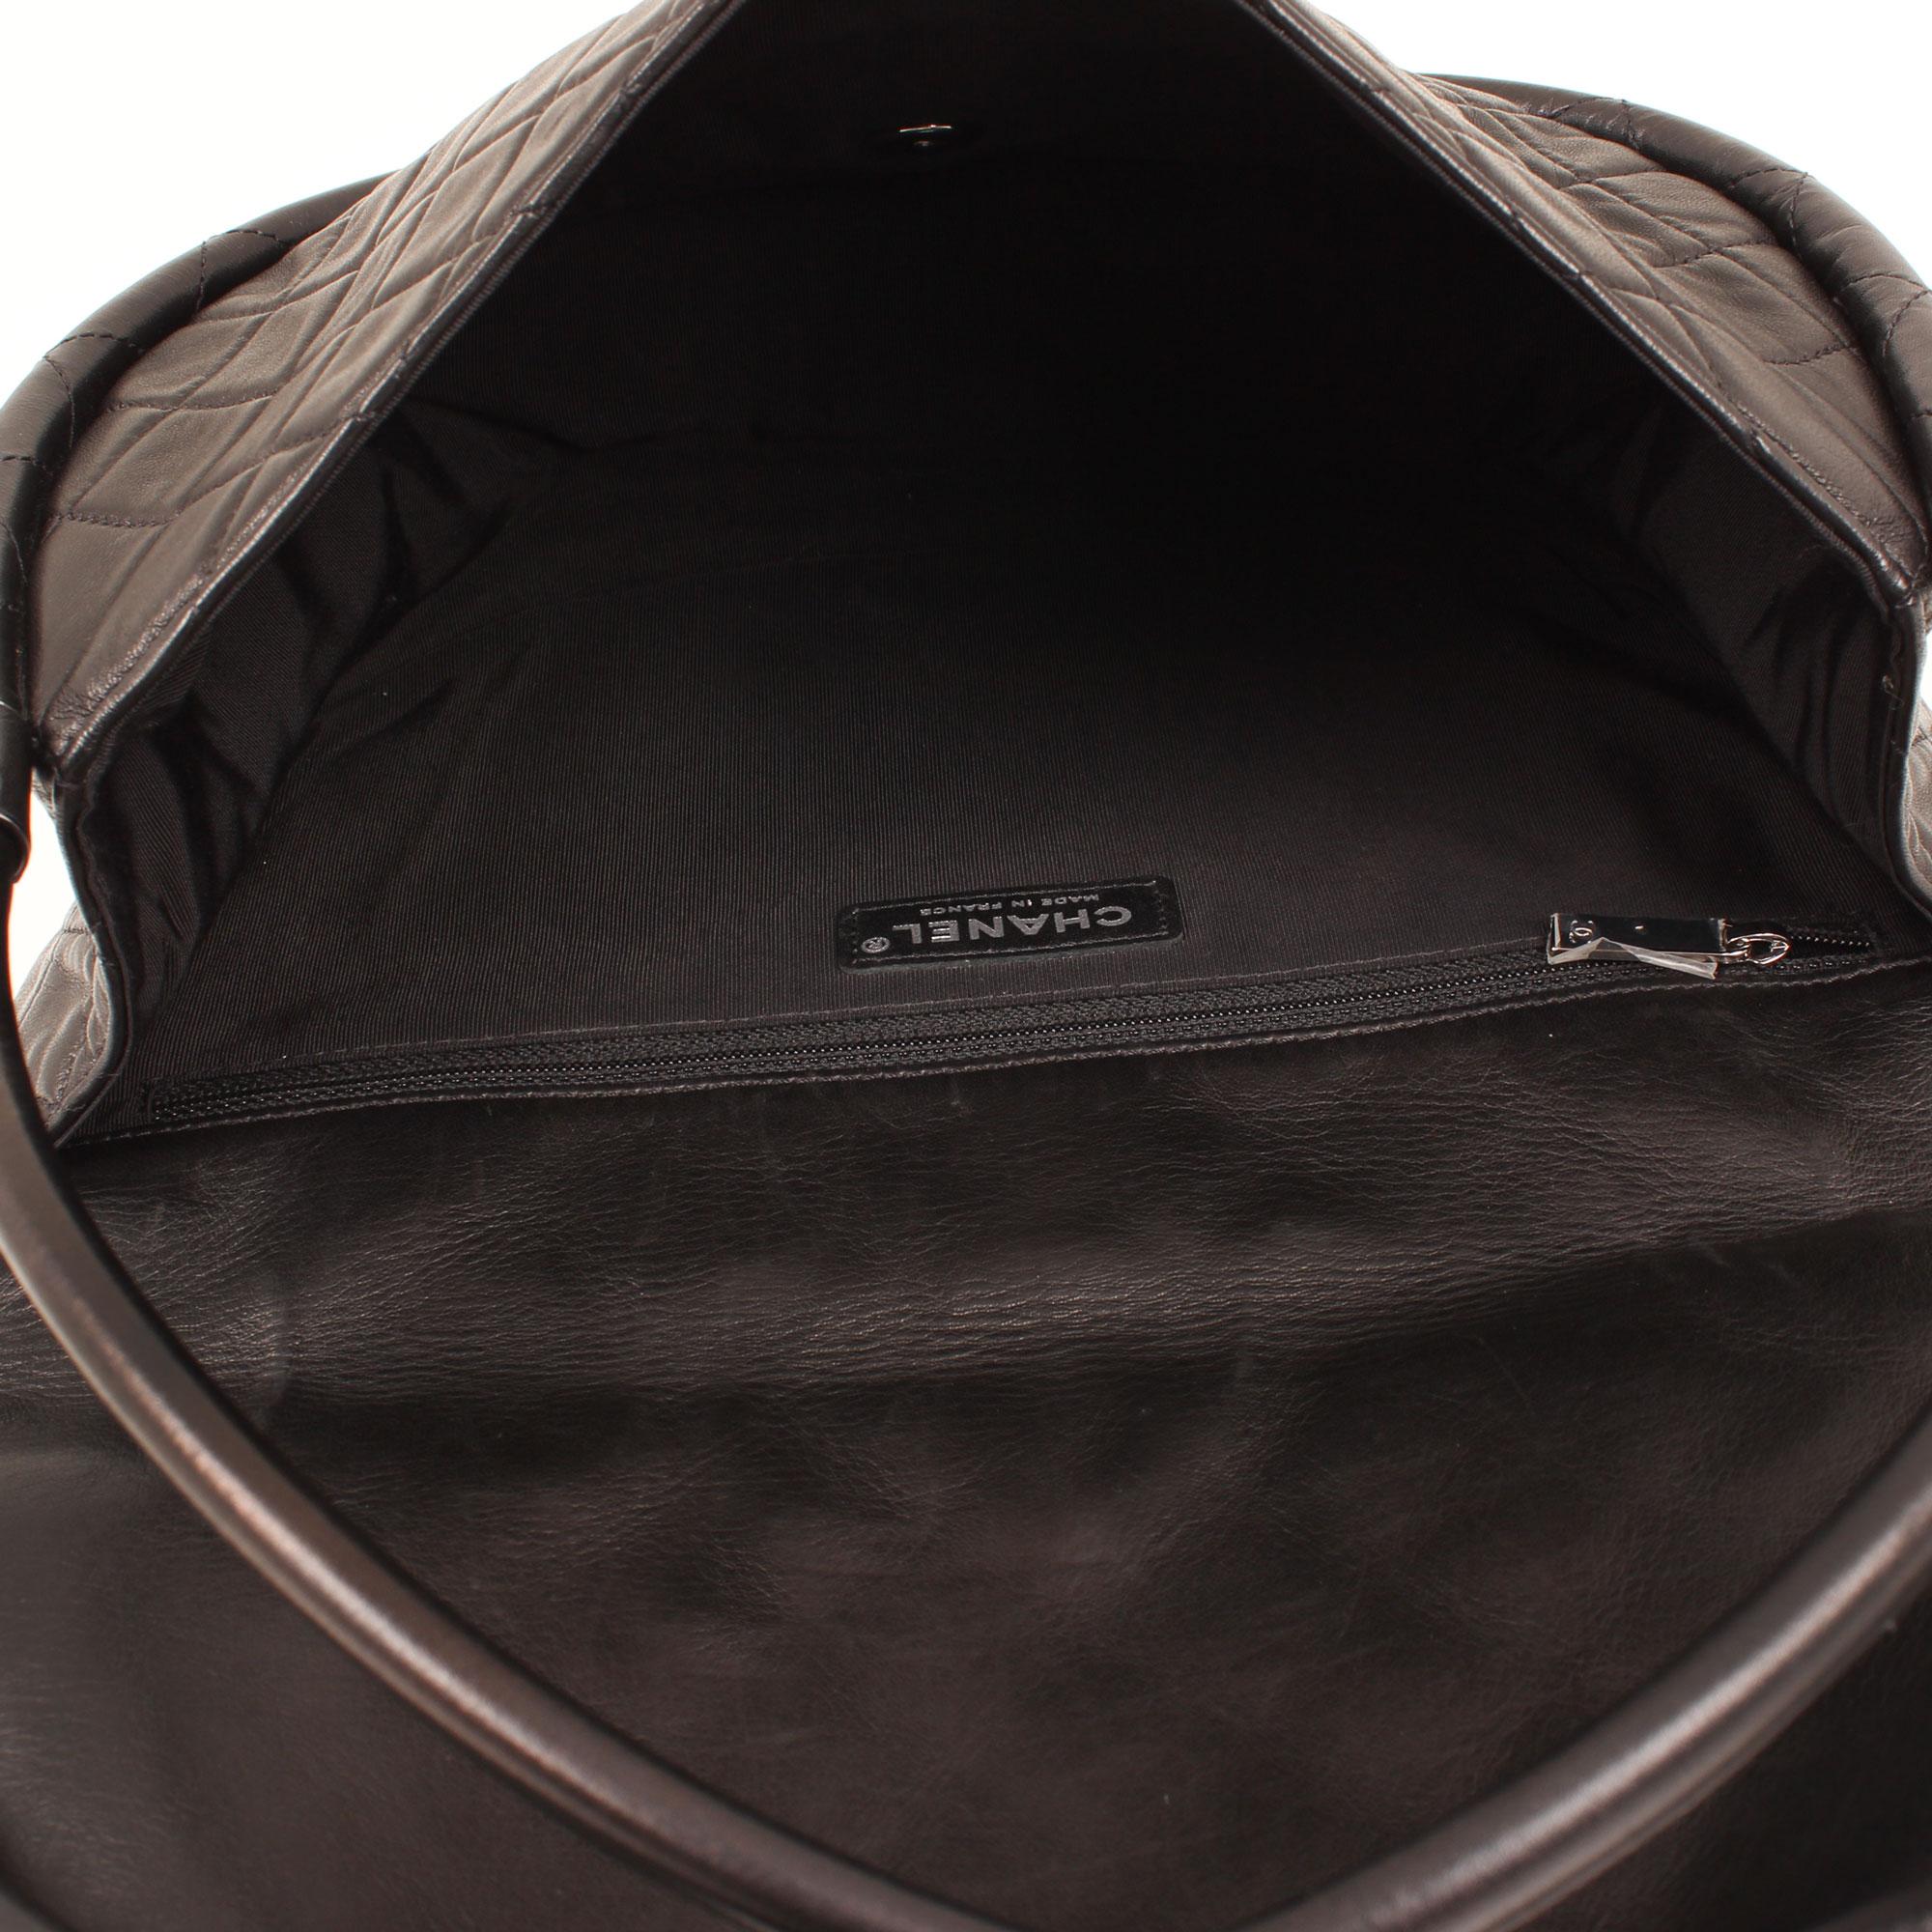 bag-chanel-hula-hoop-black-interior